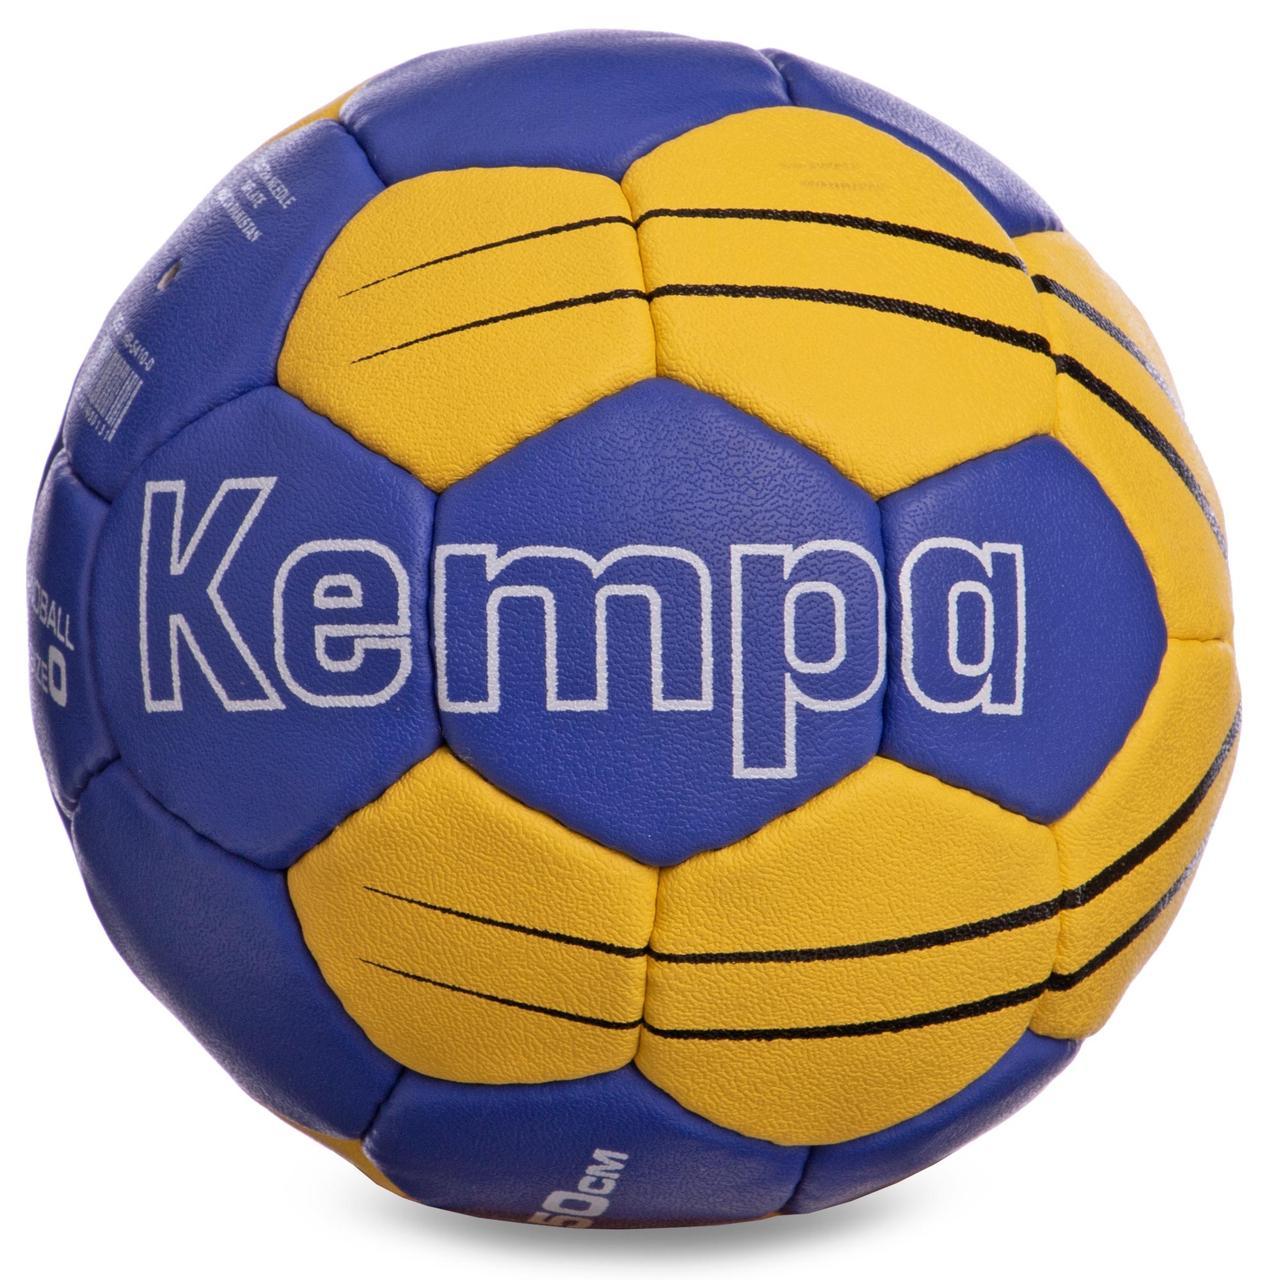 Мяч для гандбола KEMPA HB-5410-0 (PU, р-р 0, сшит вручную, голубой-желтый)